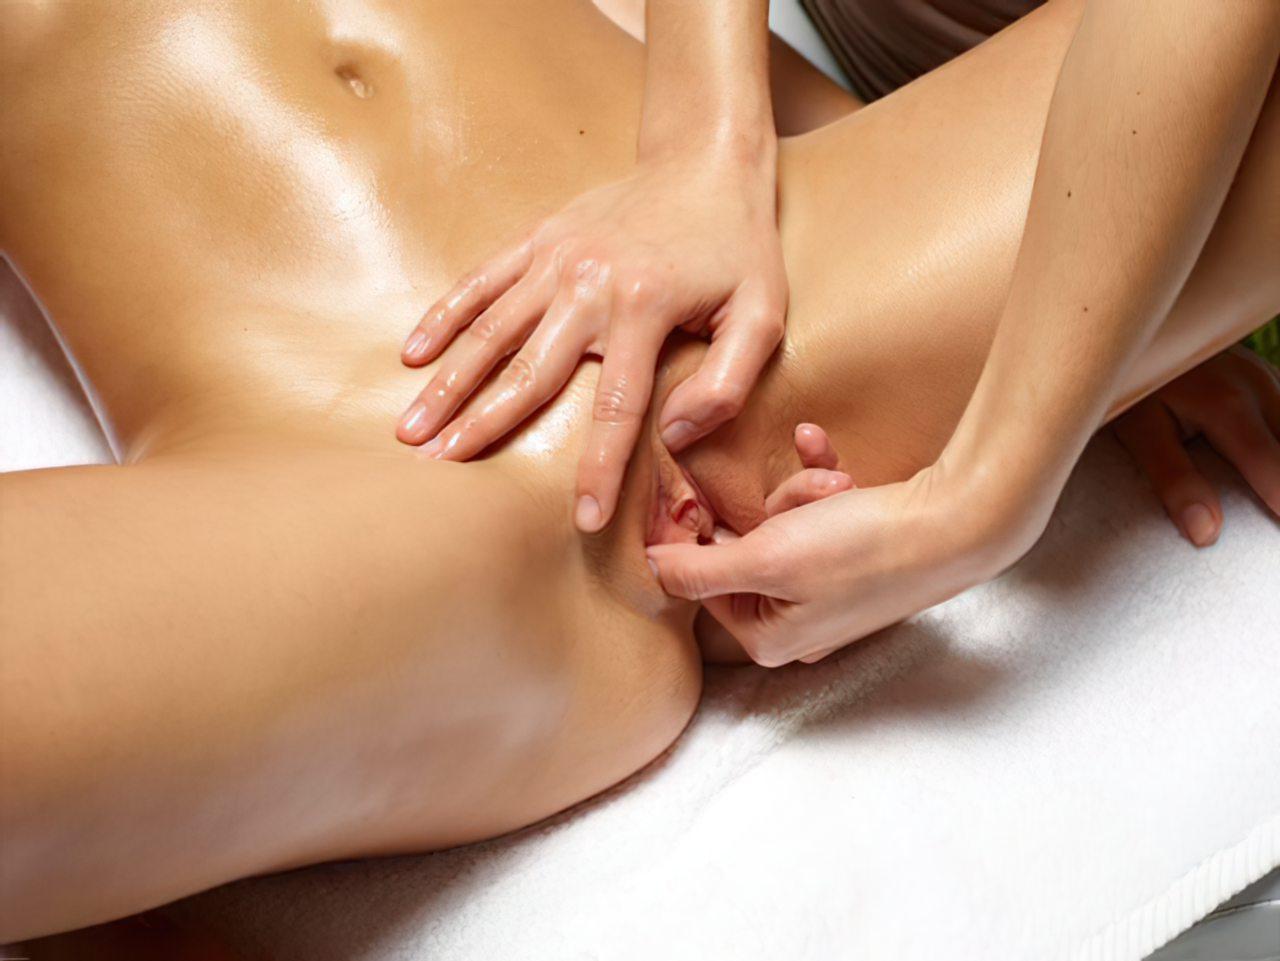 swedish erotic massage videos maksuton porno